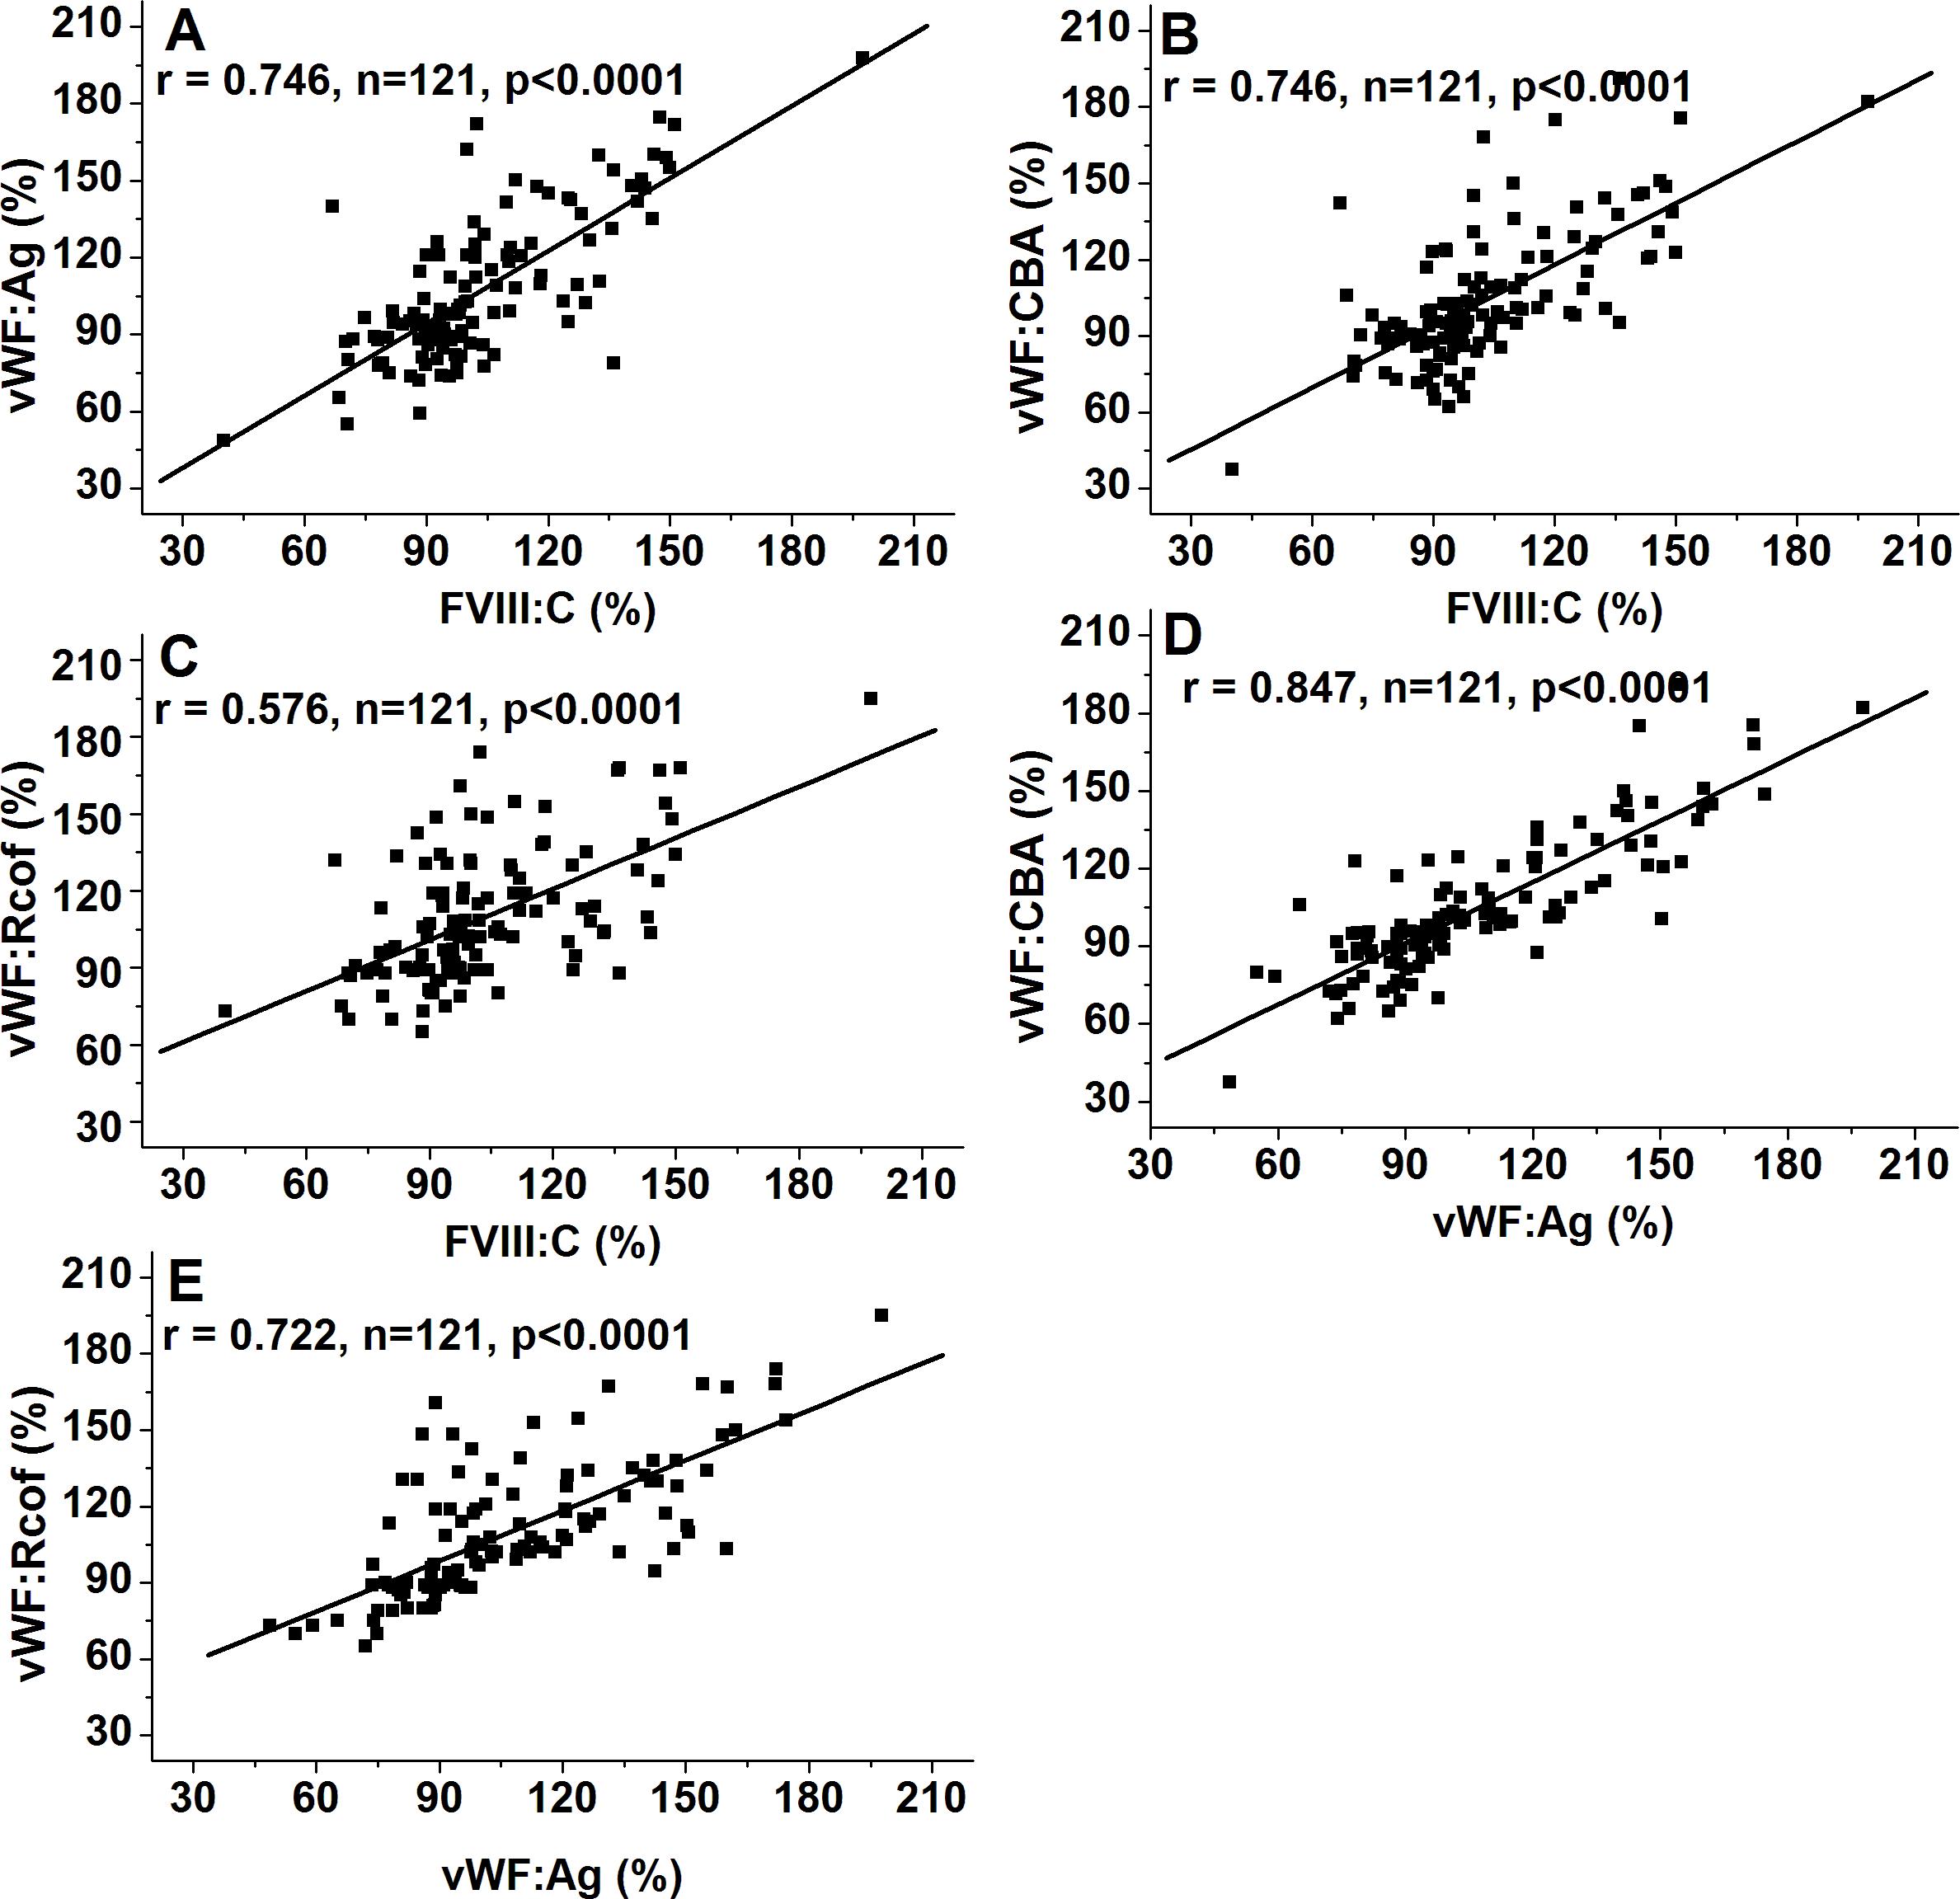 Influences of ABO blood group, age and gender on plasma coagulation